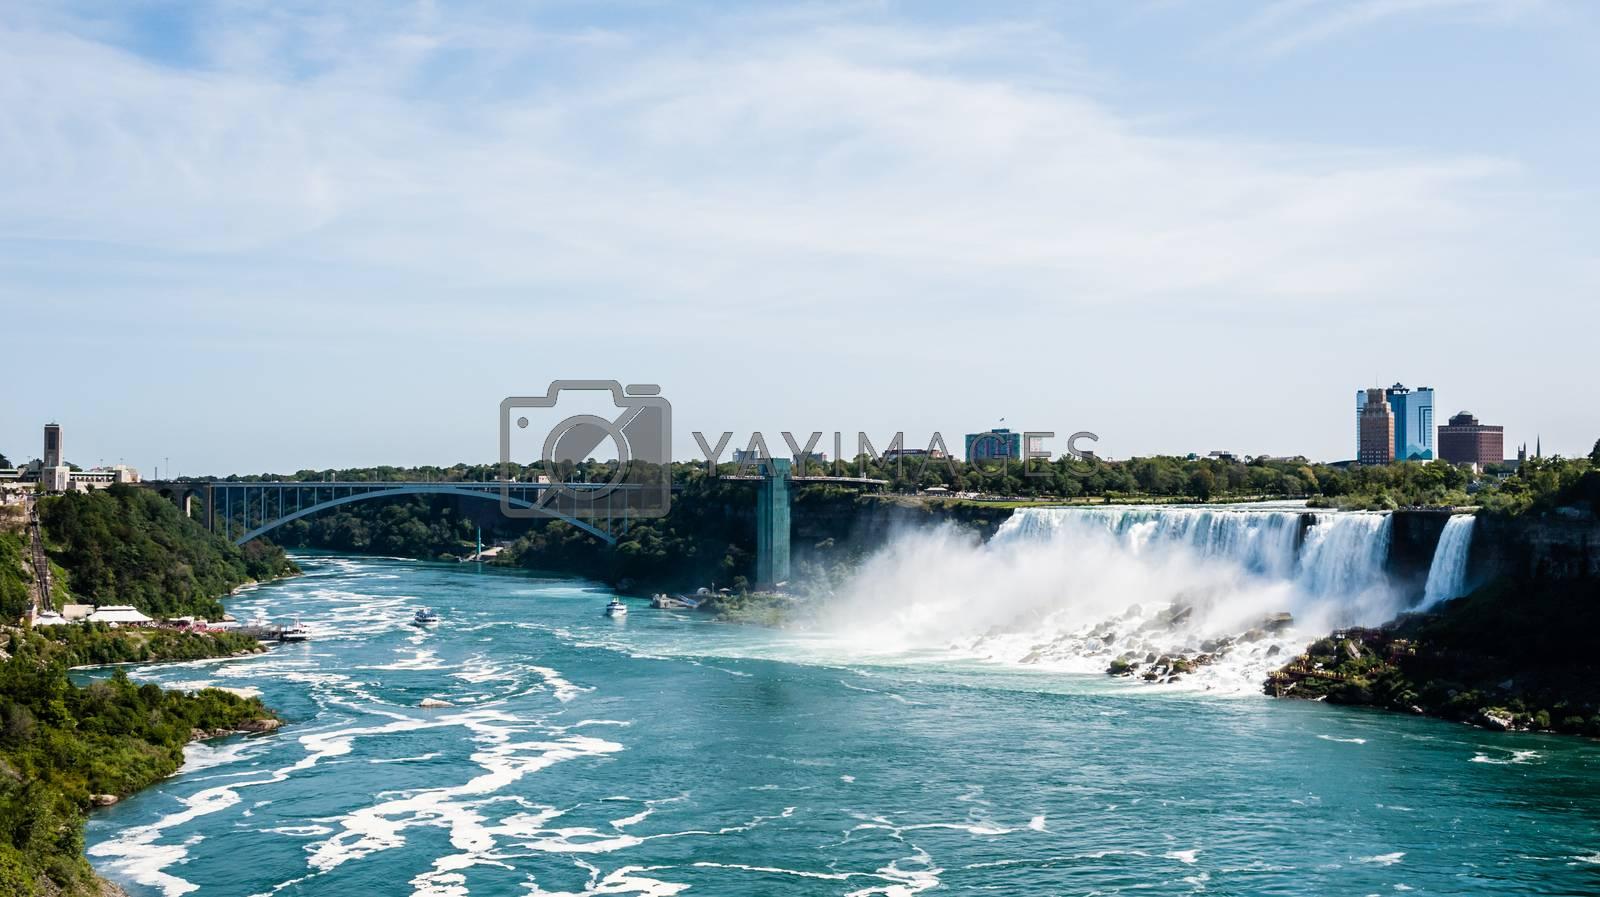 NIAGARA FALLS, CANADA - AUGUST 27, 2017: Tour boats pass under the Rainbow Bridge on the Niagara River to visit the waterfalls.